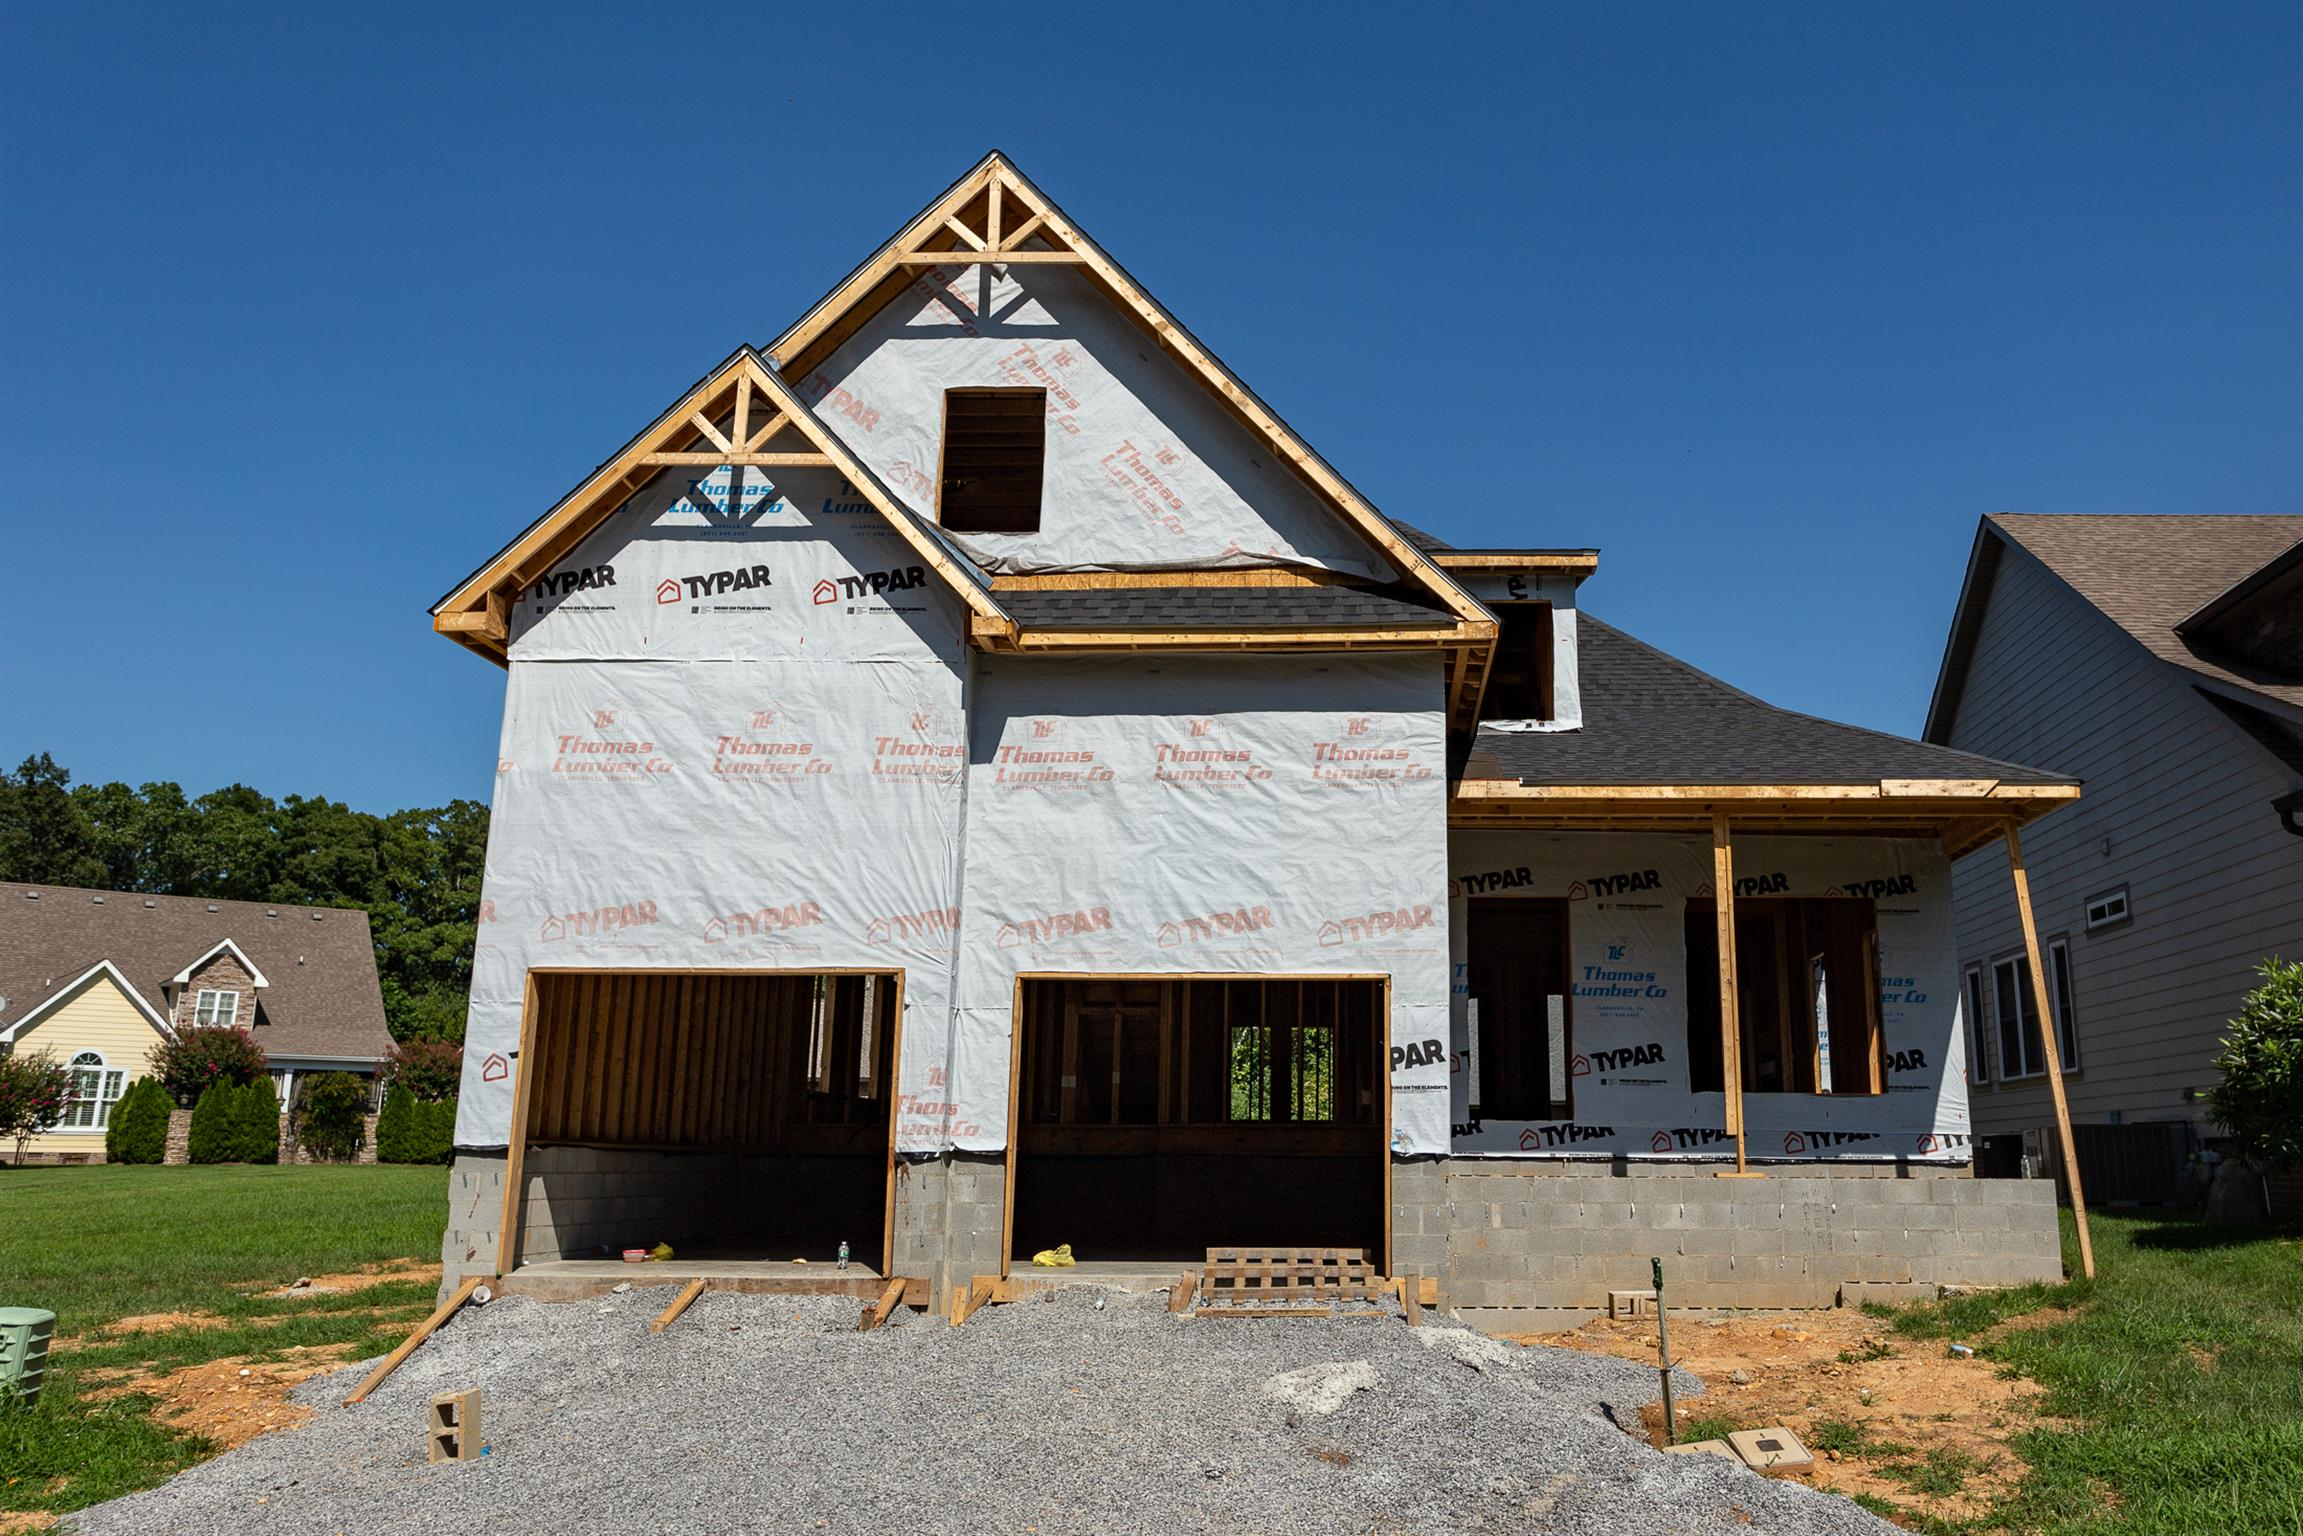 517 SUMMIT VIEW CIRCLE, Clarksville, TN 37043 - Clarksville, TN real estate listing